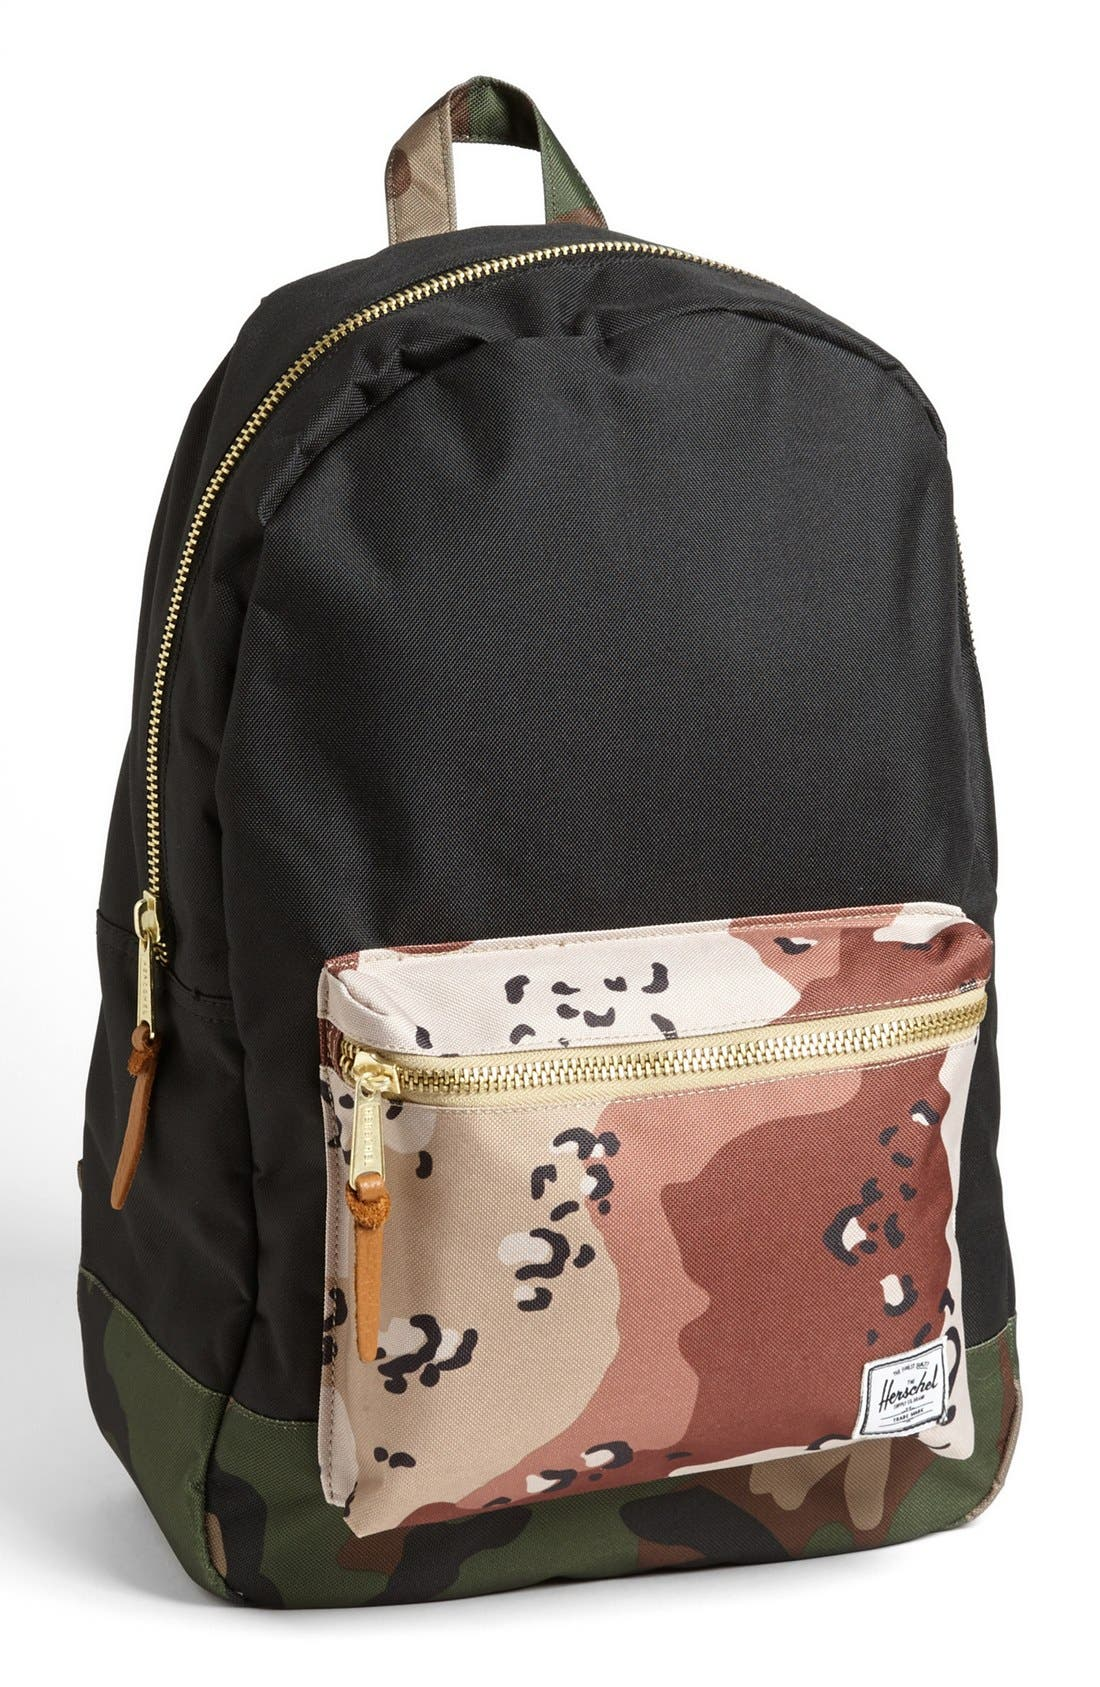 Alternate Image 1 Selected - Herschel Supply Co. Settlement Backpack